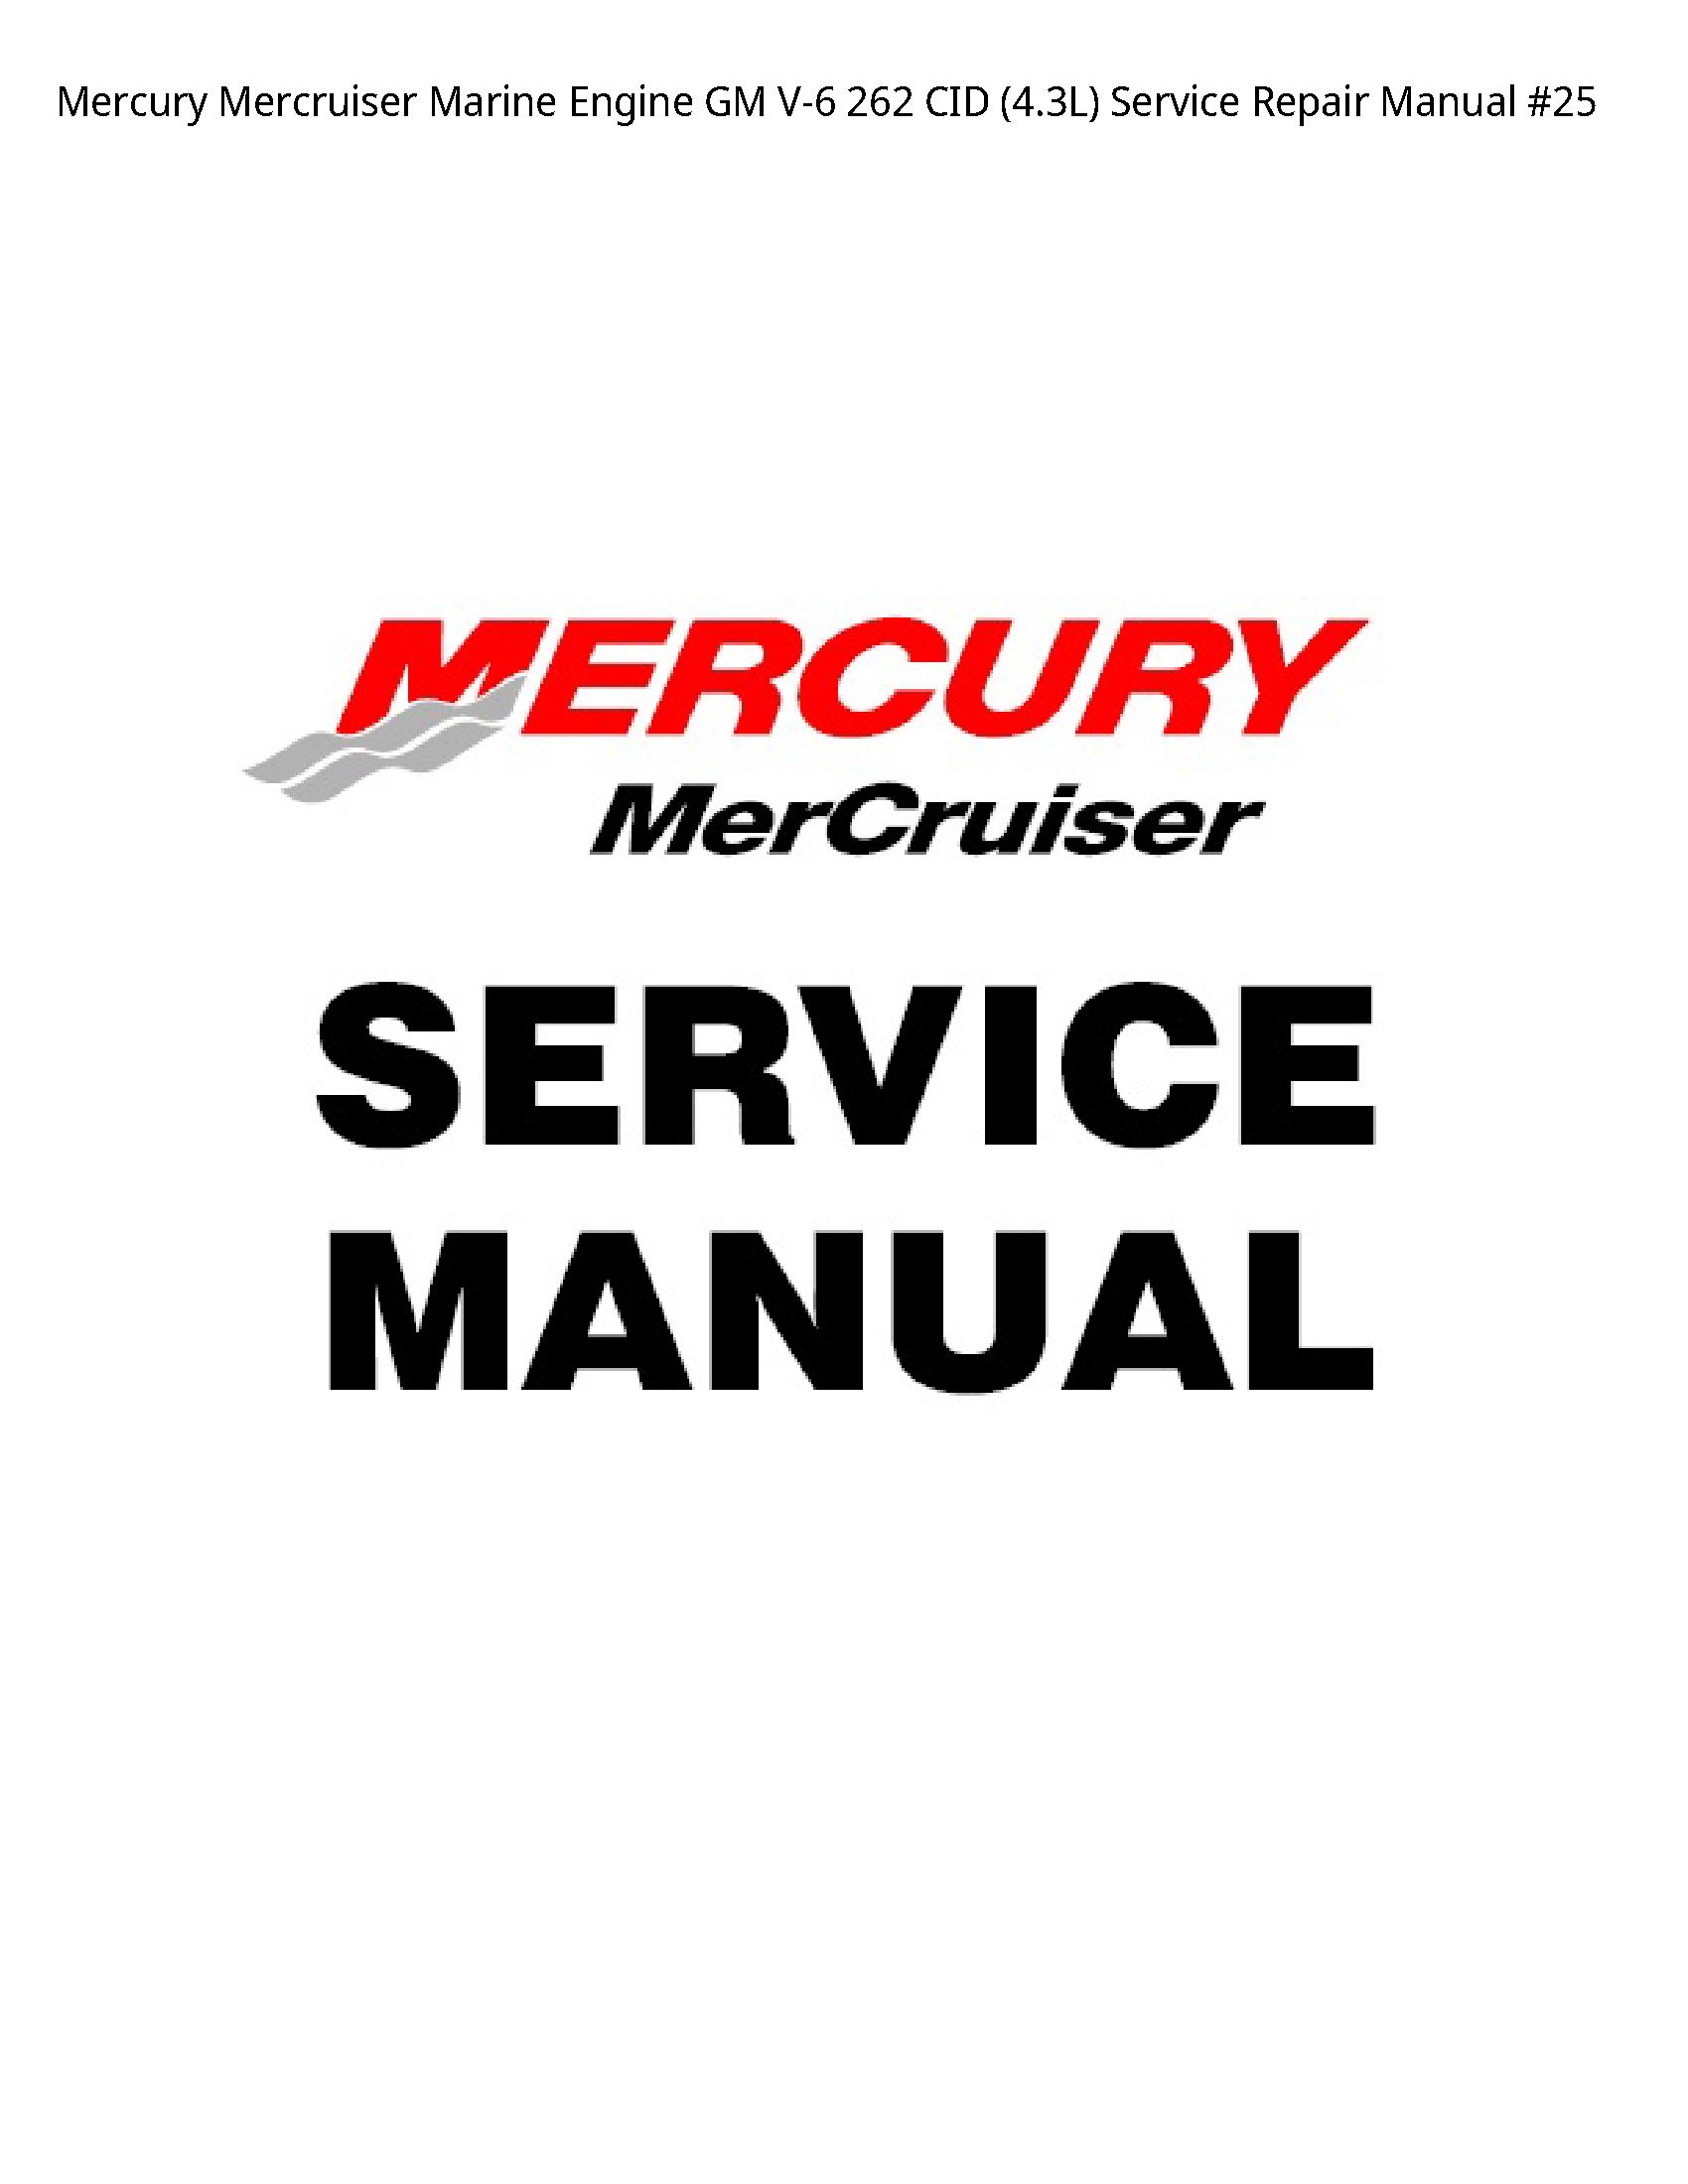 Mercury V-6 Mercruiser Marine Engine GM CID manual